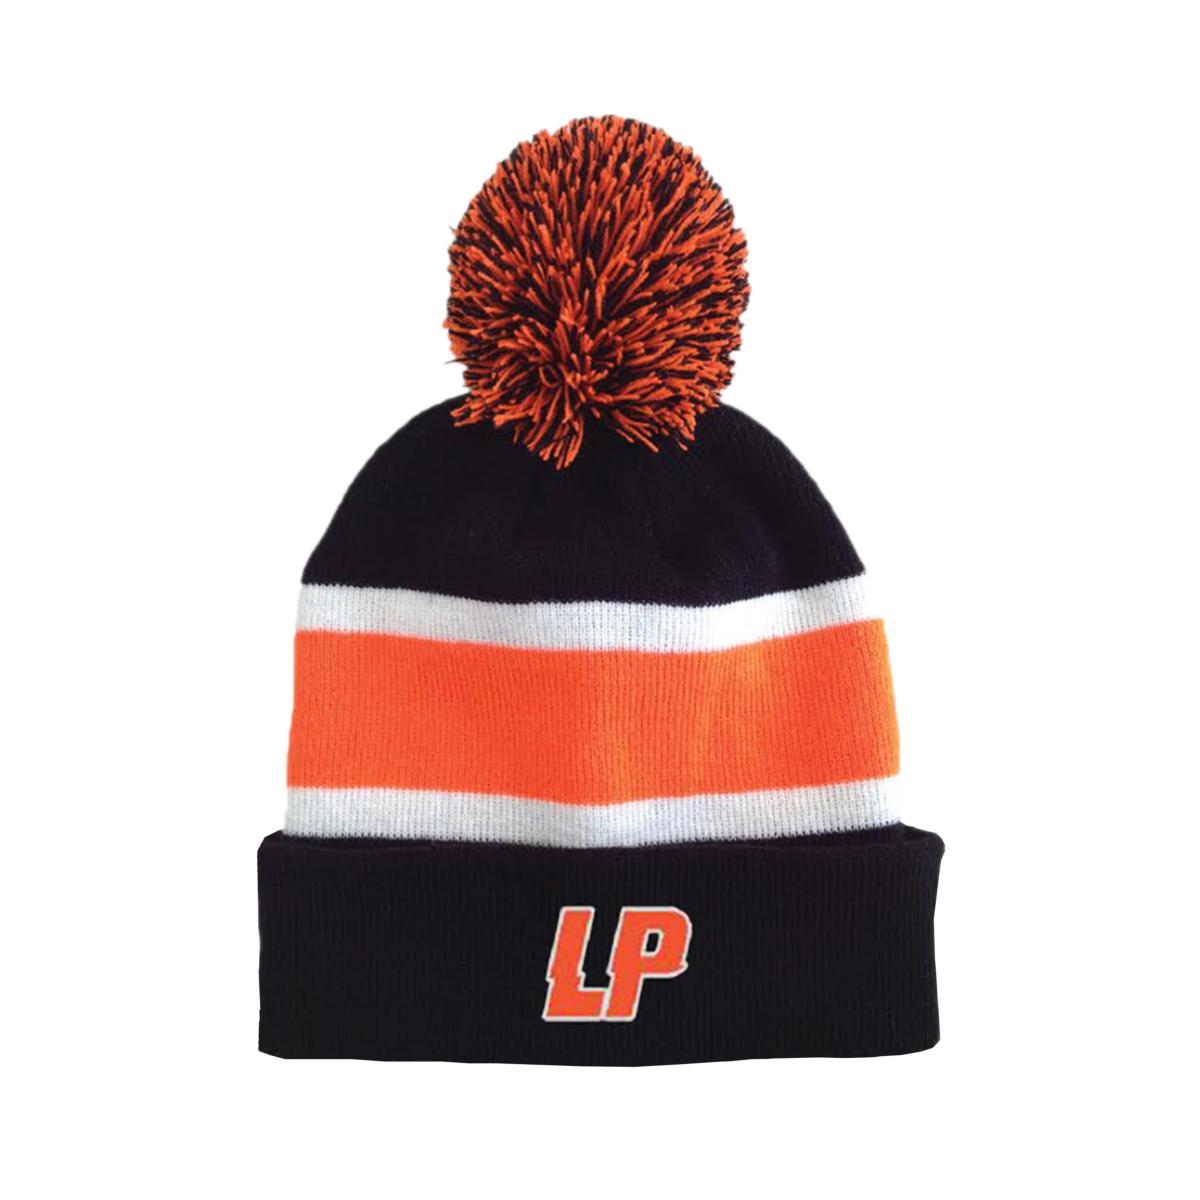 LP - Logo Striped Winter Black and Orange Pom Beanie